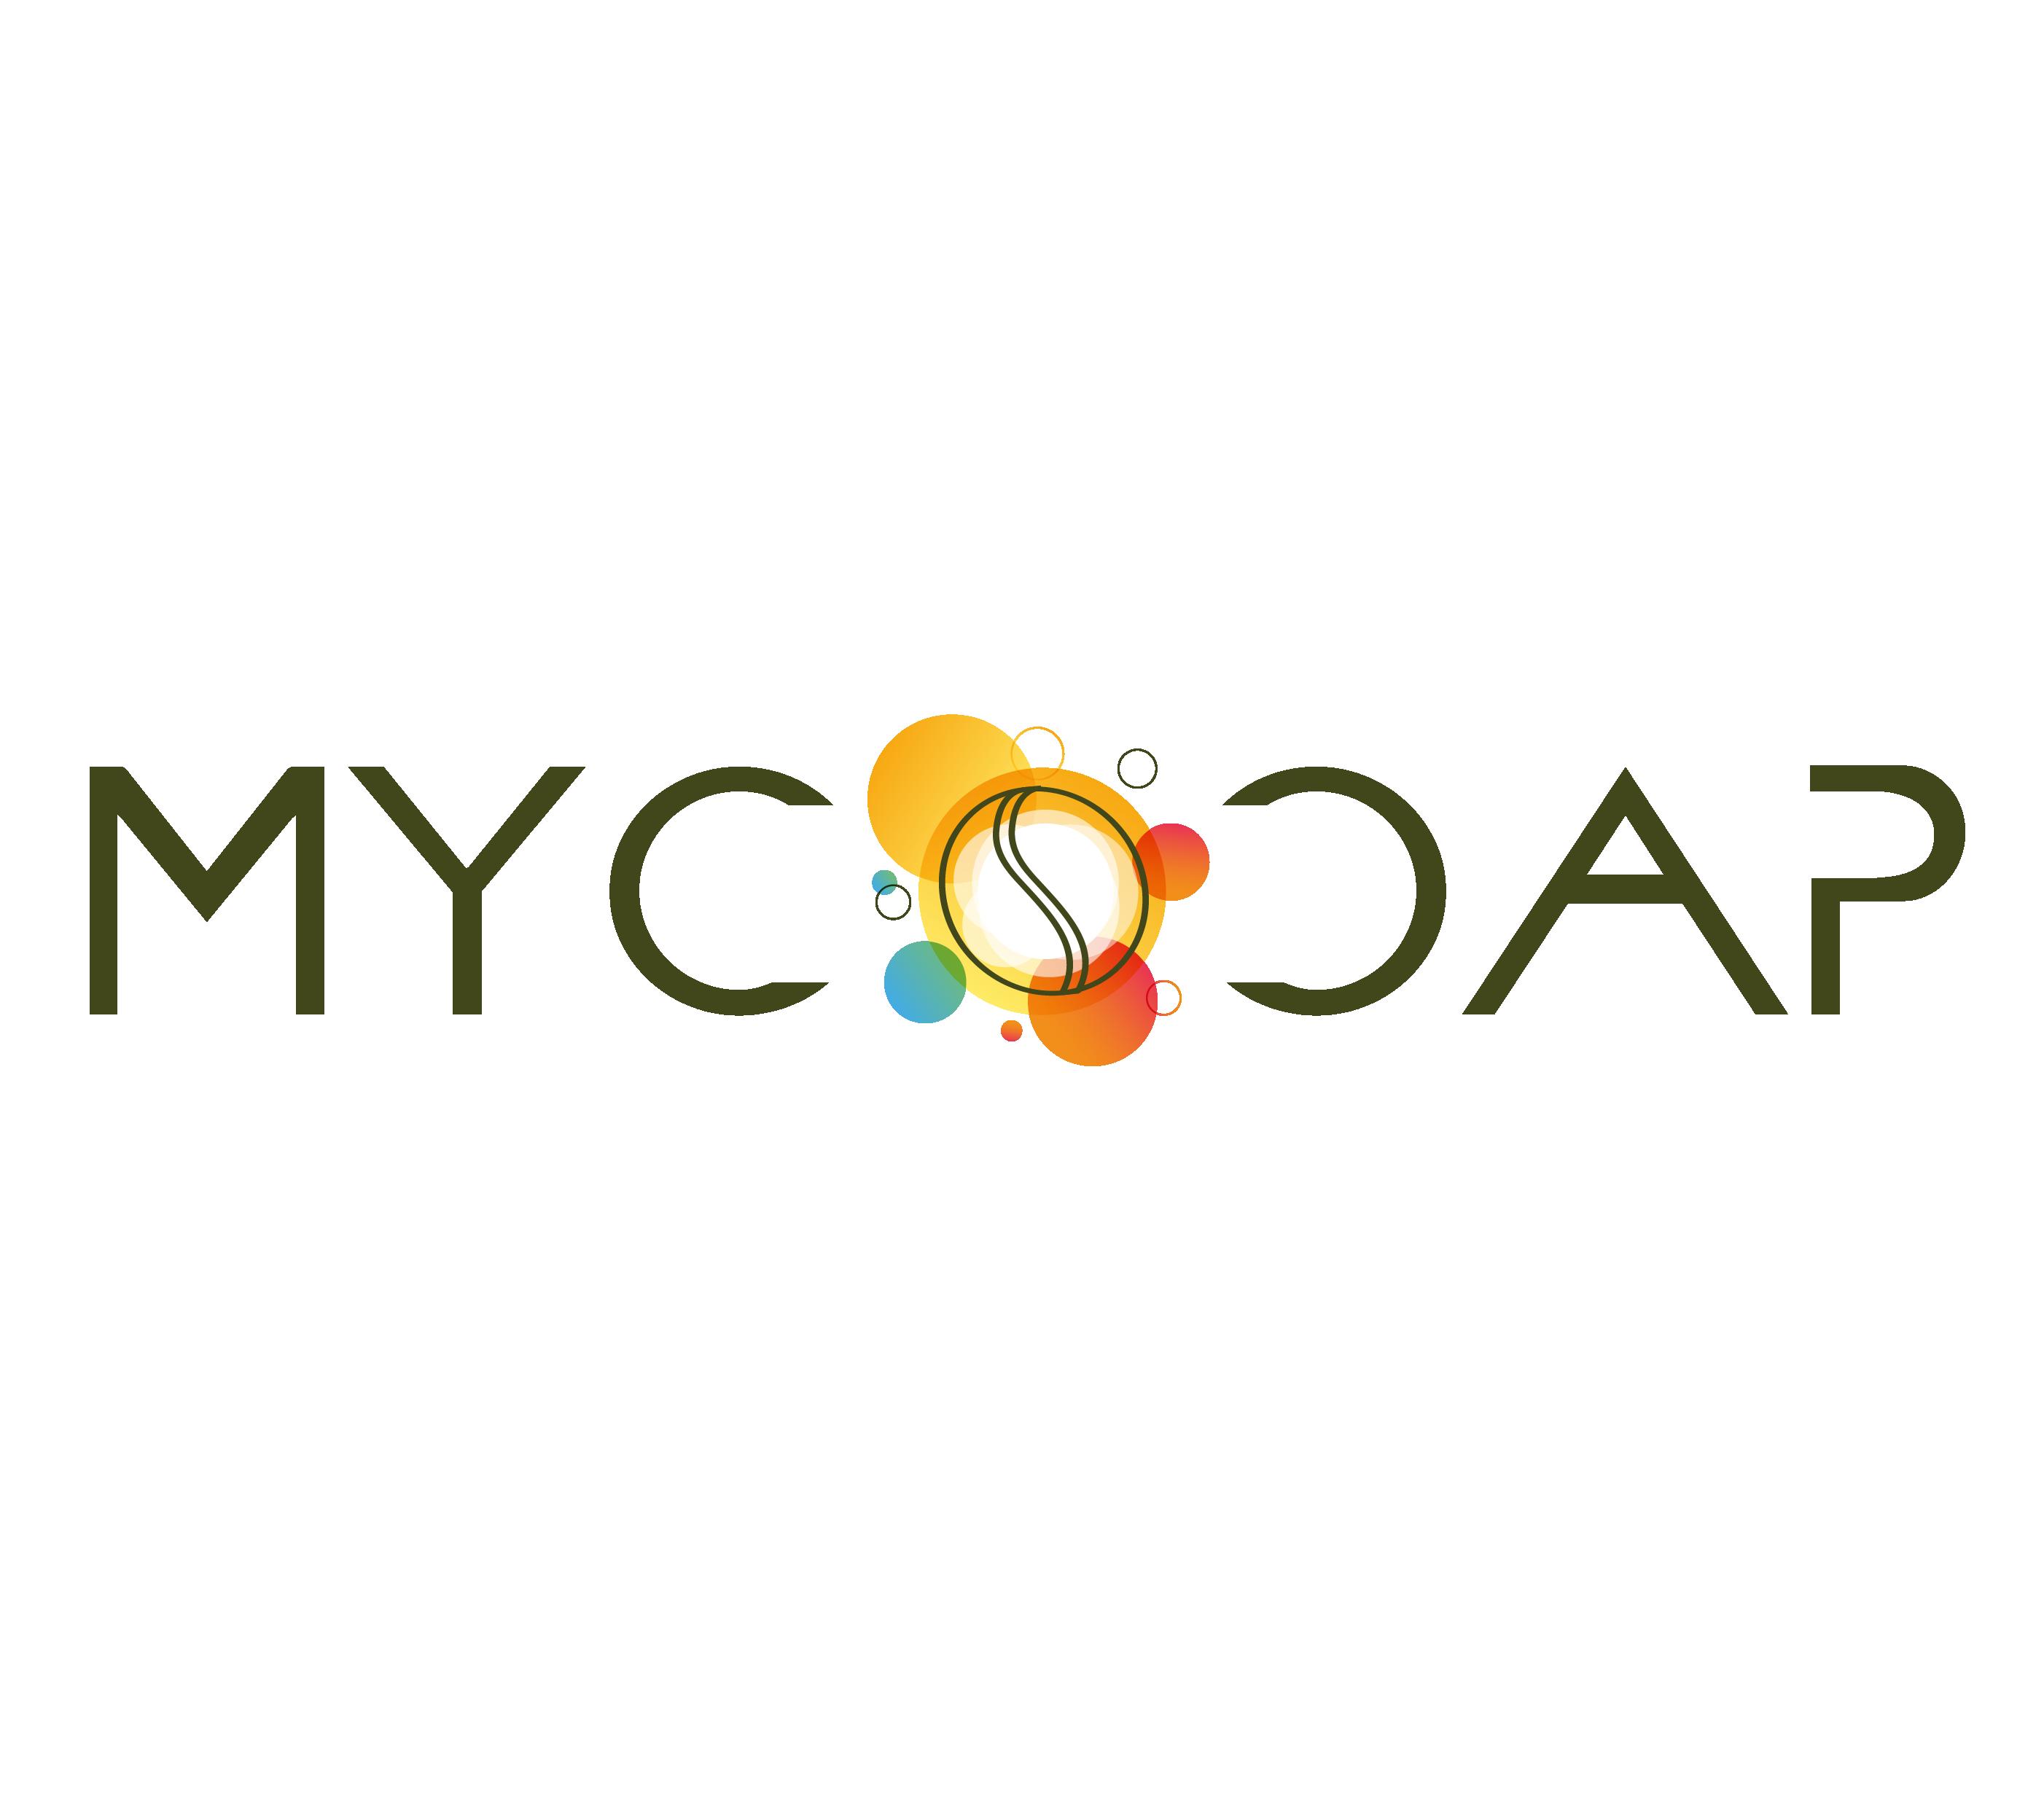 MYCOCAP